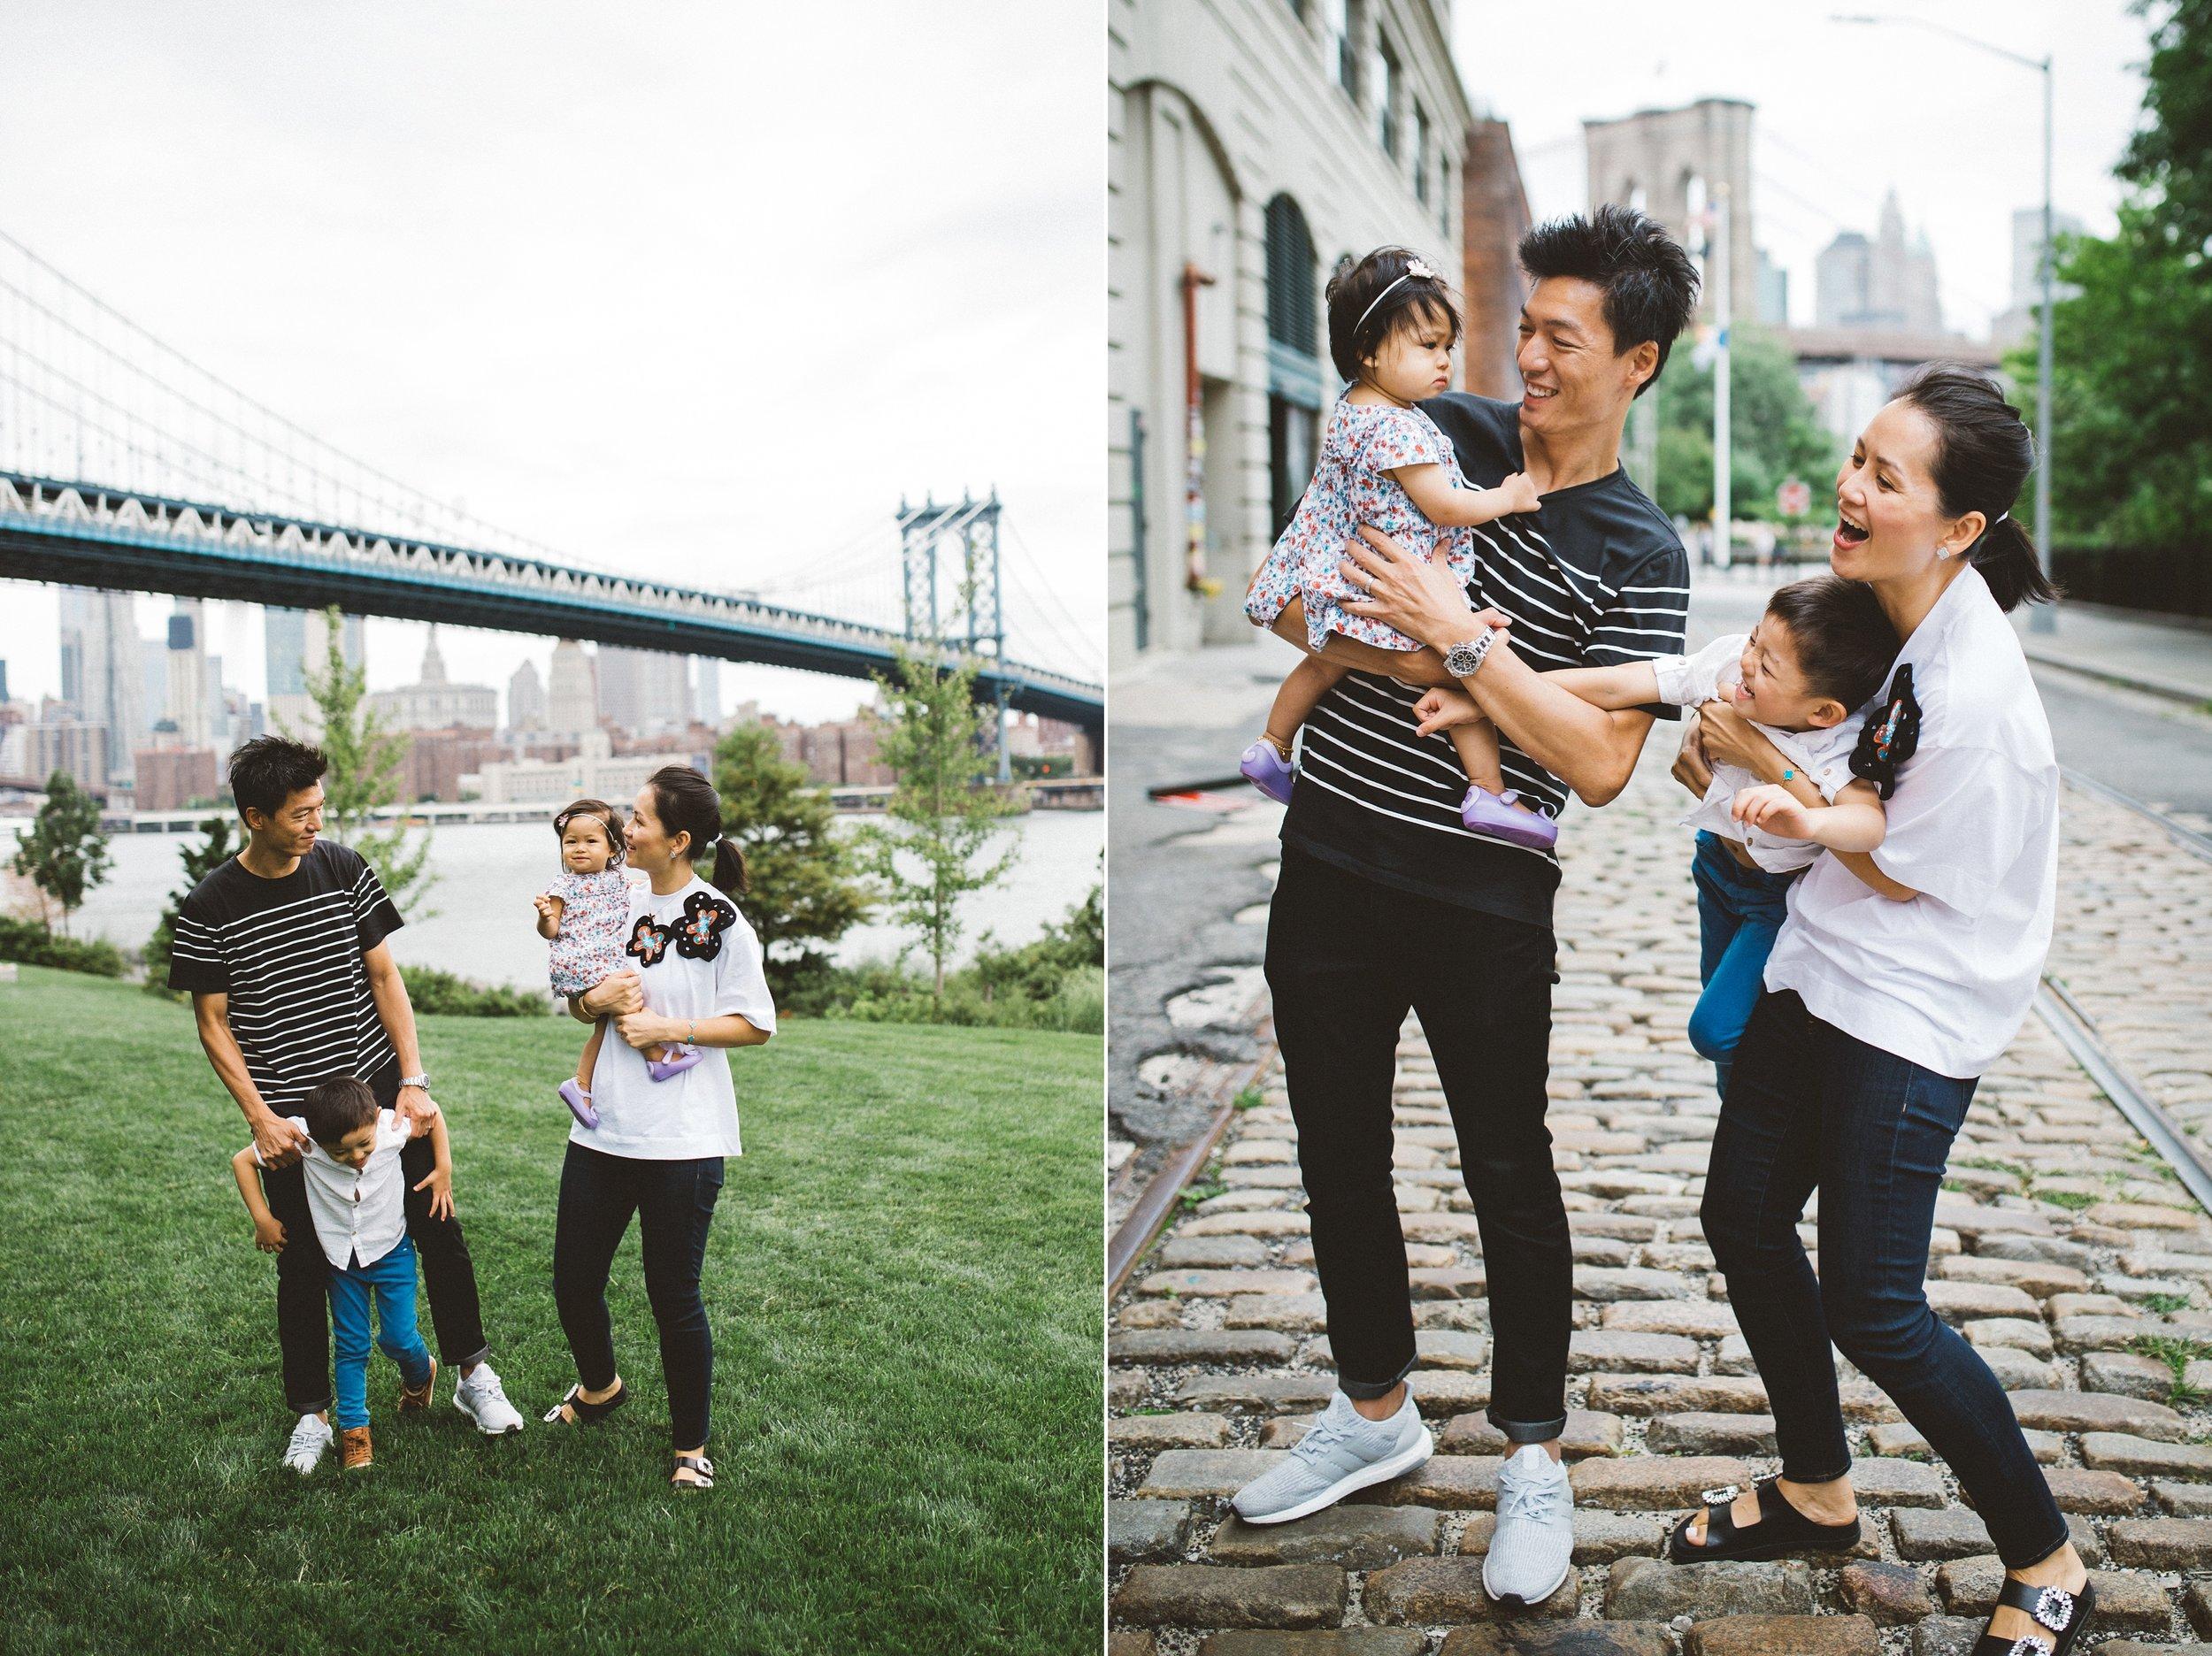 brooklyn bridge park family photography_0061.jpg